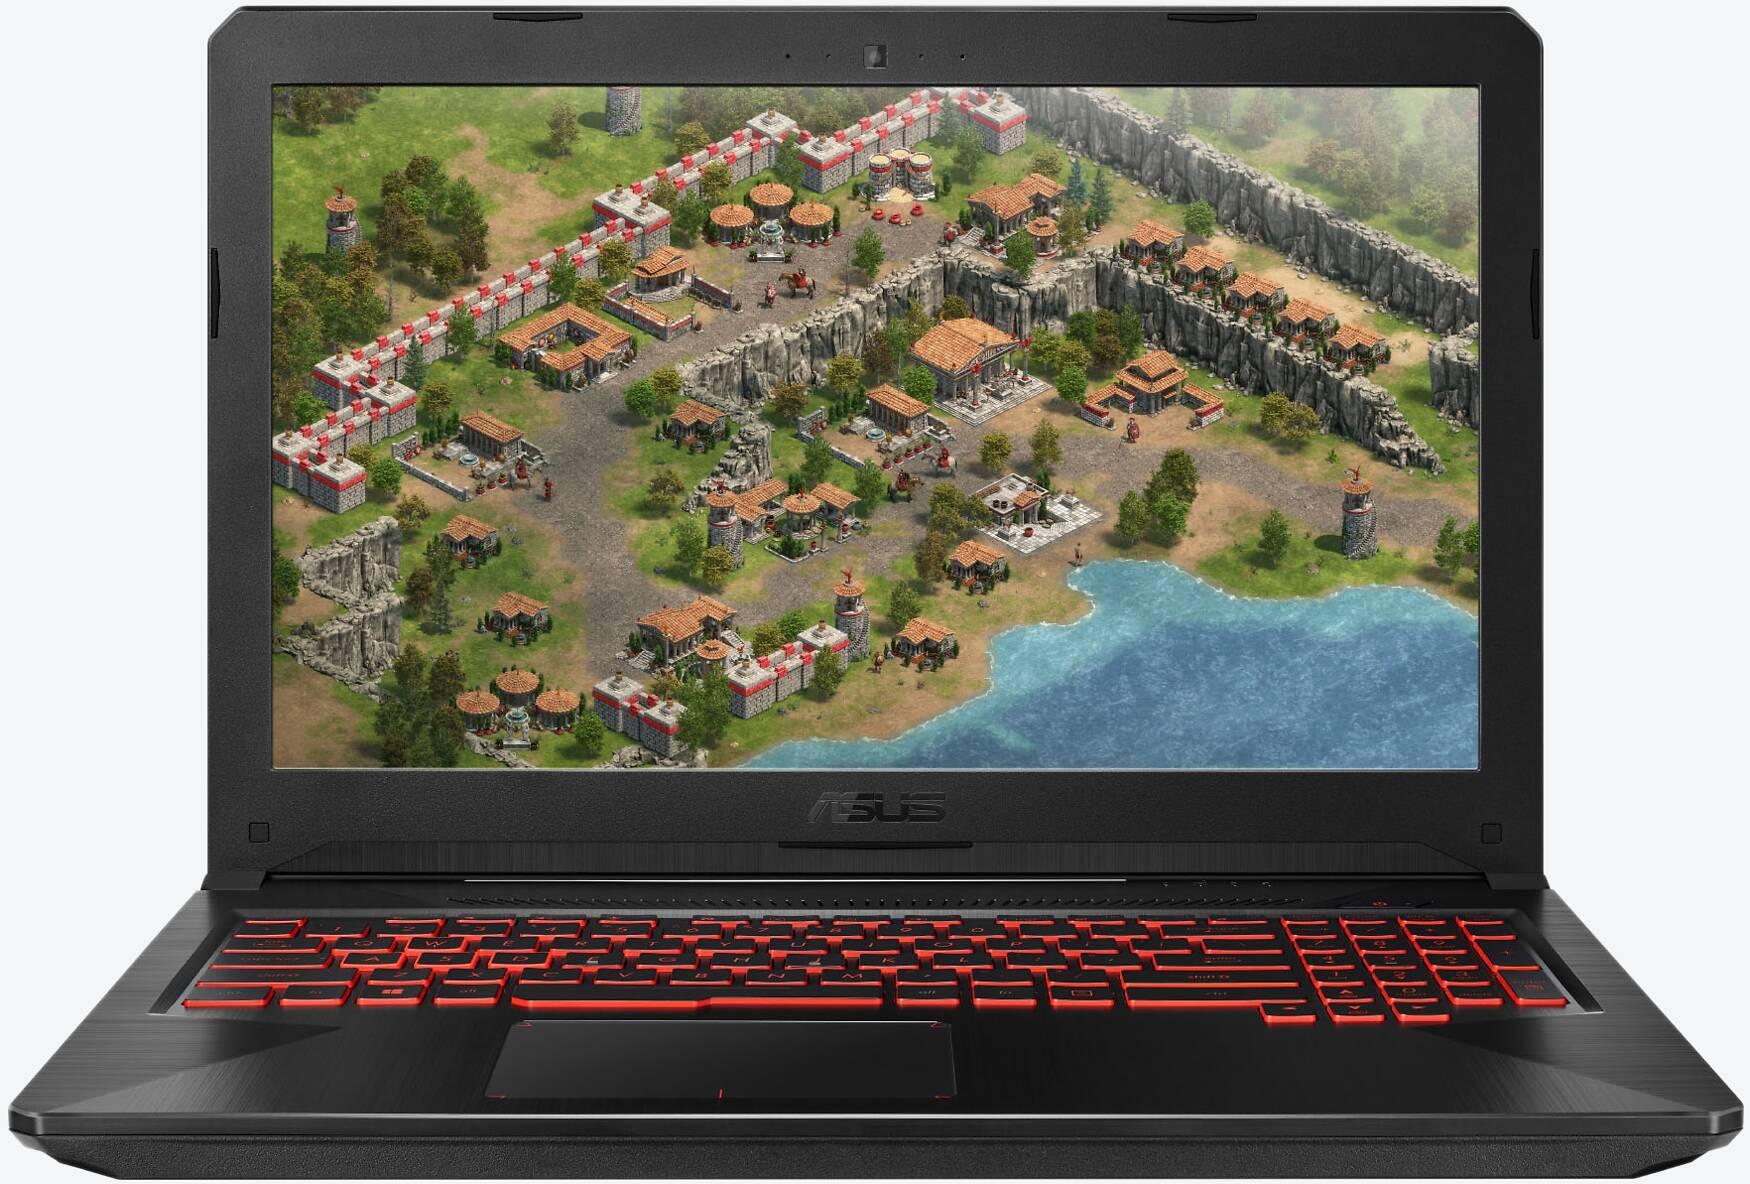 ASUS TUF Gaming FX504GD-DM932T